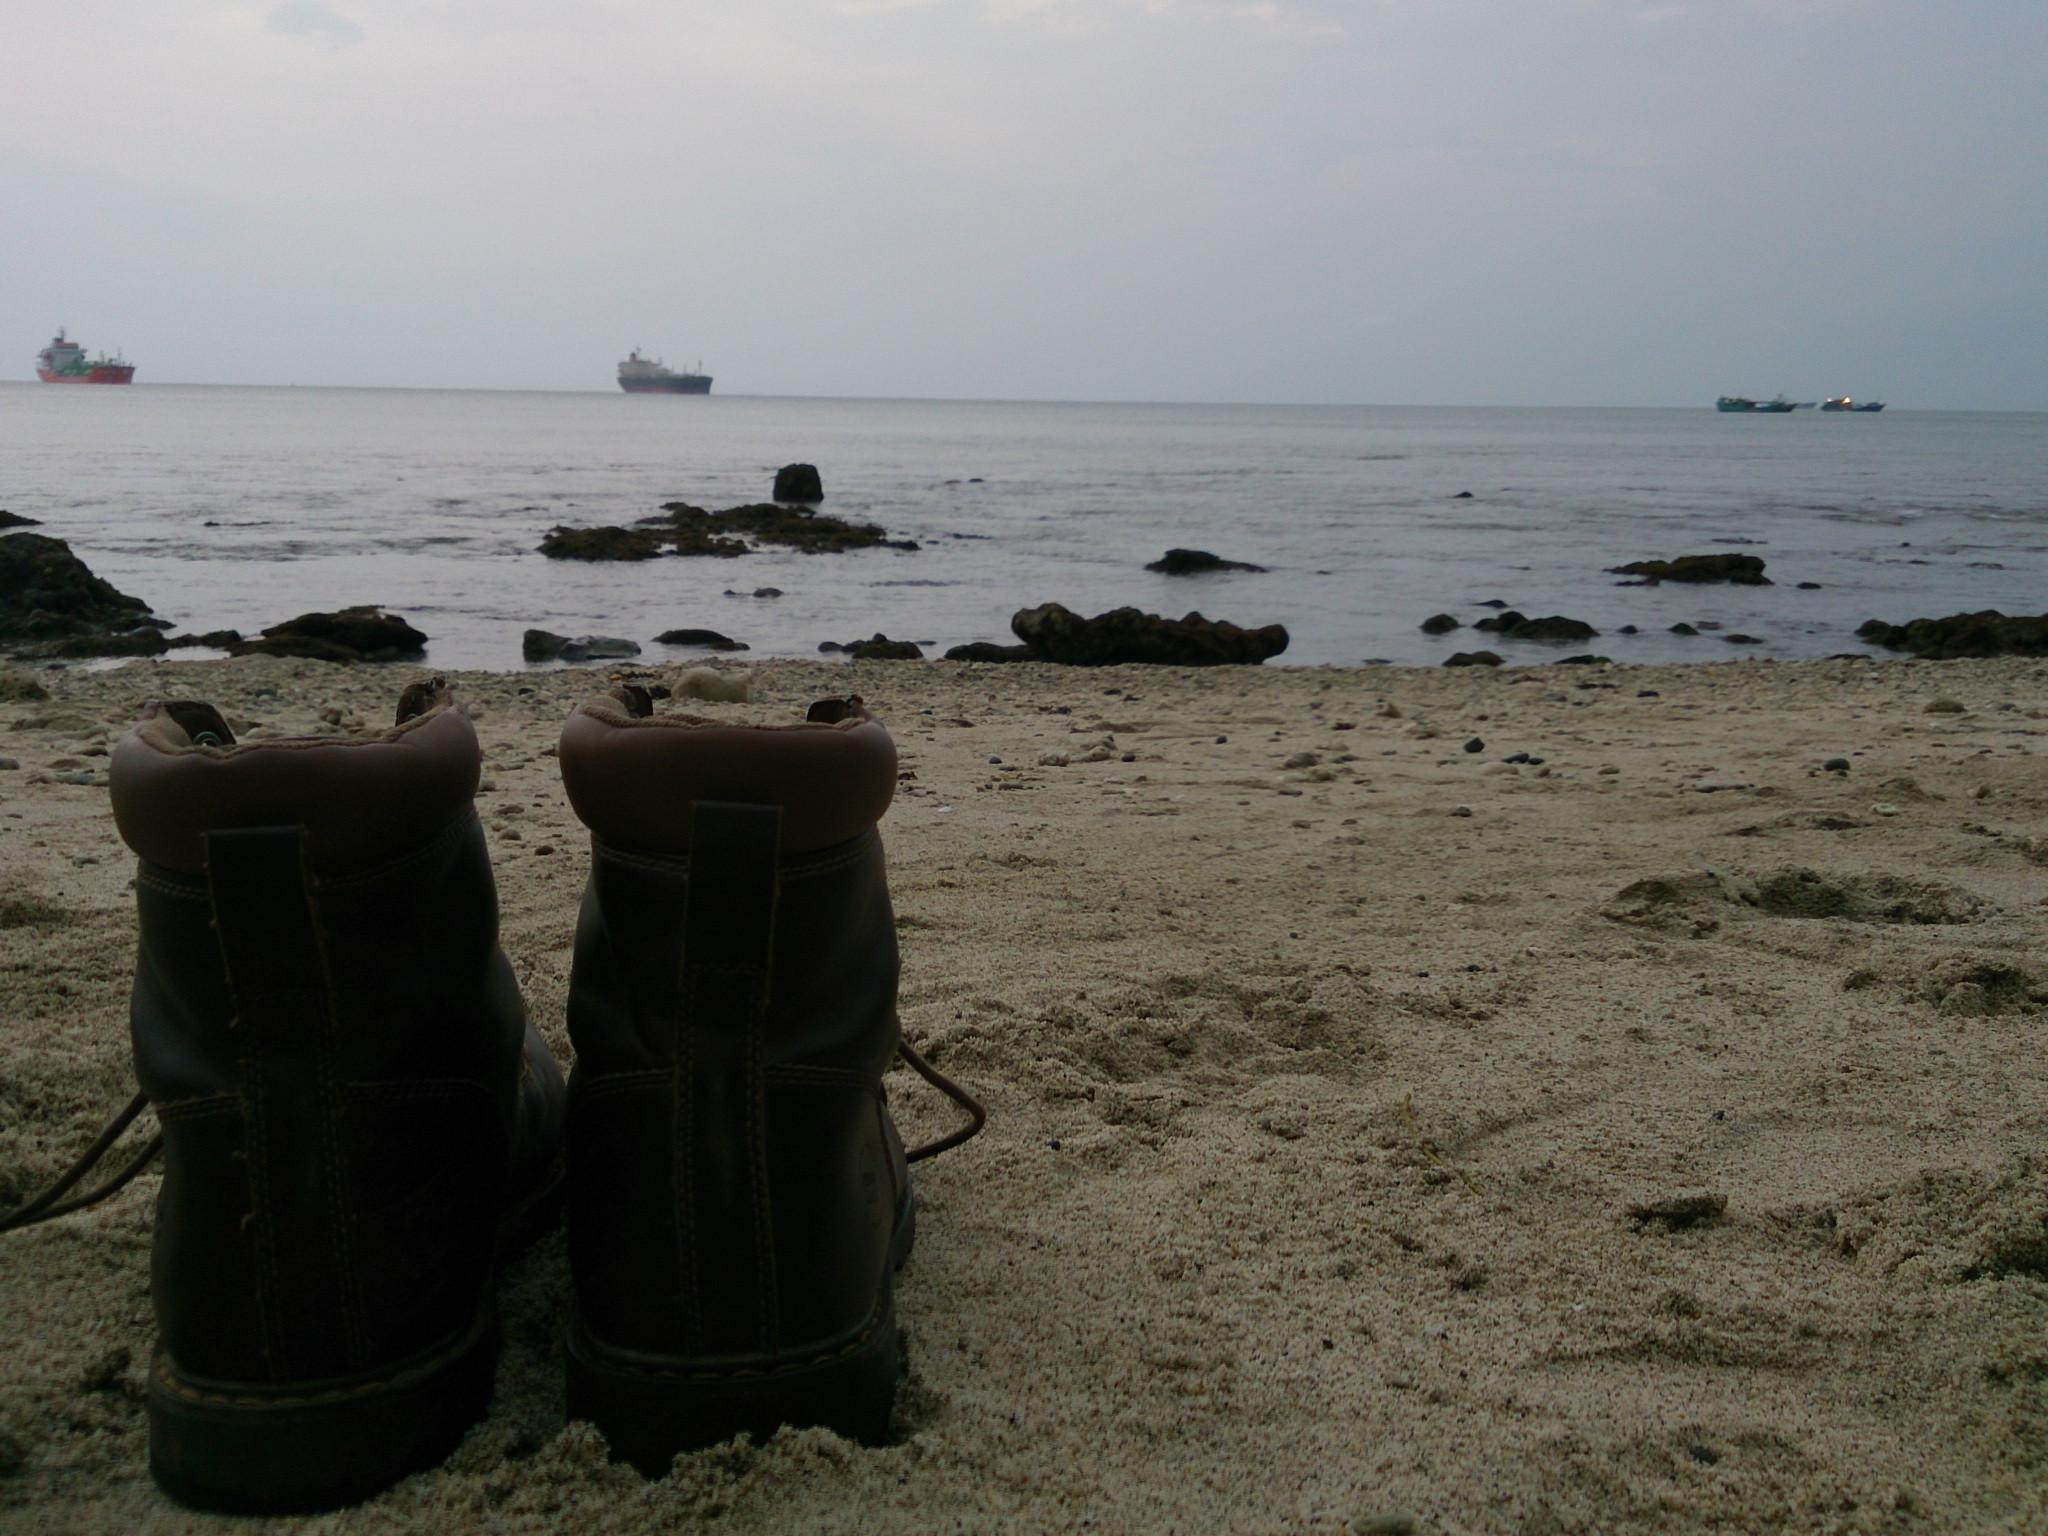 Menikmati senja di Pantai Karang Pandang, Pulau Nusakambangan. (Liputan6.com/Oscar Ferri).